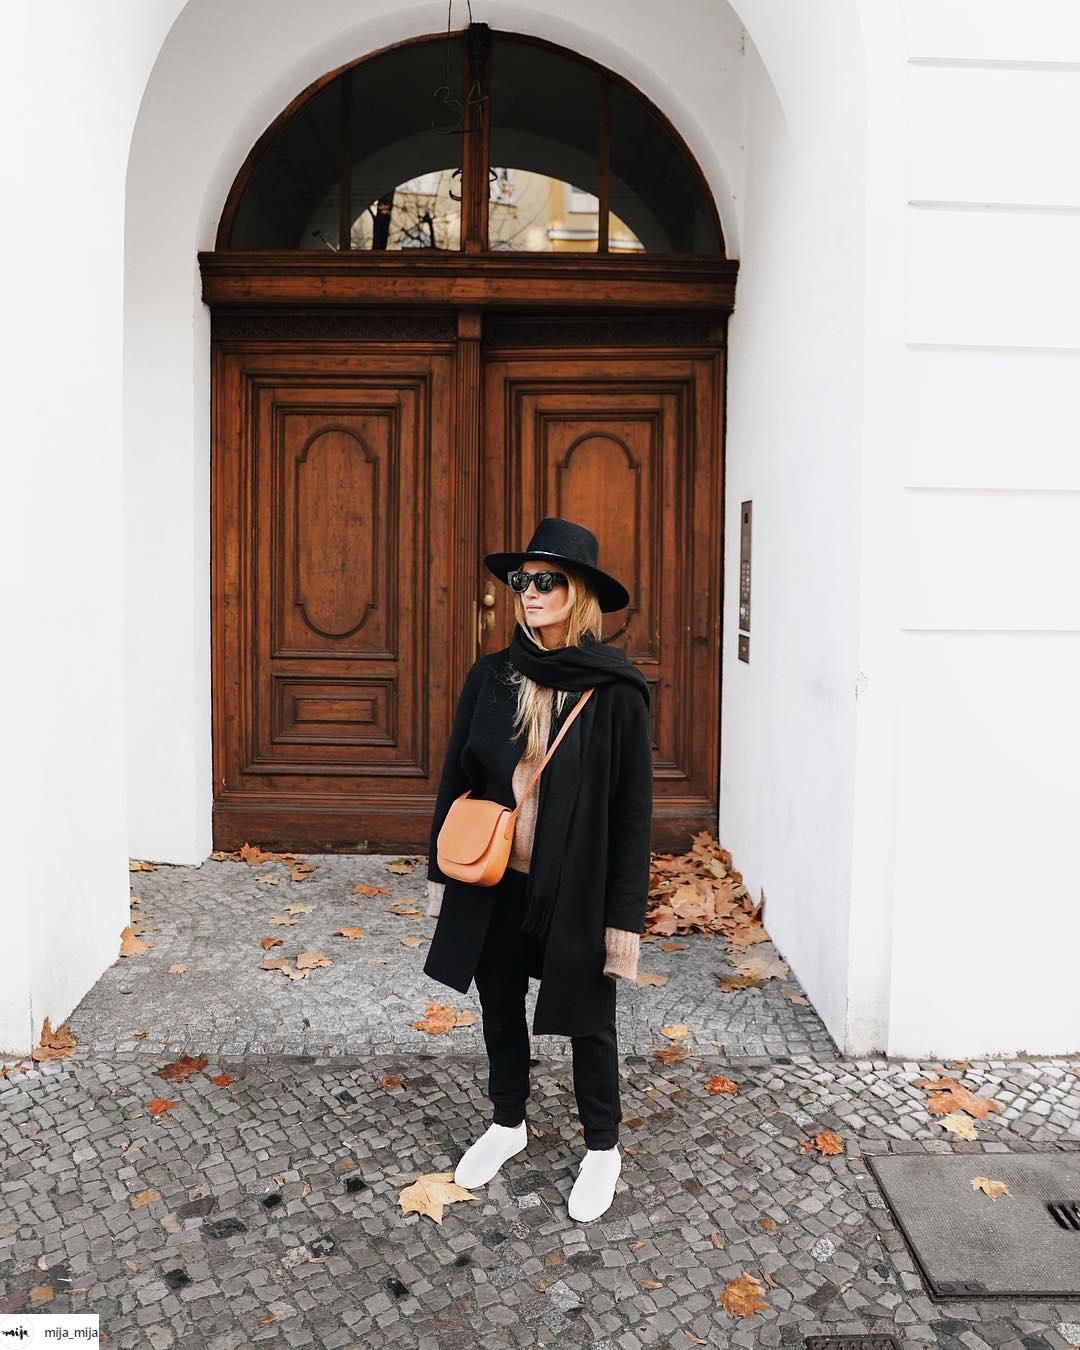 phong cách thời trang tối giản mija_mija 3